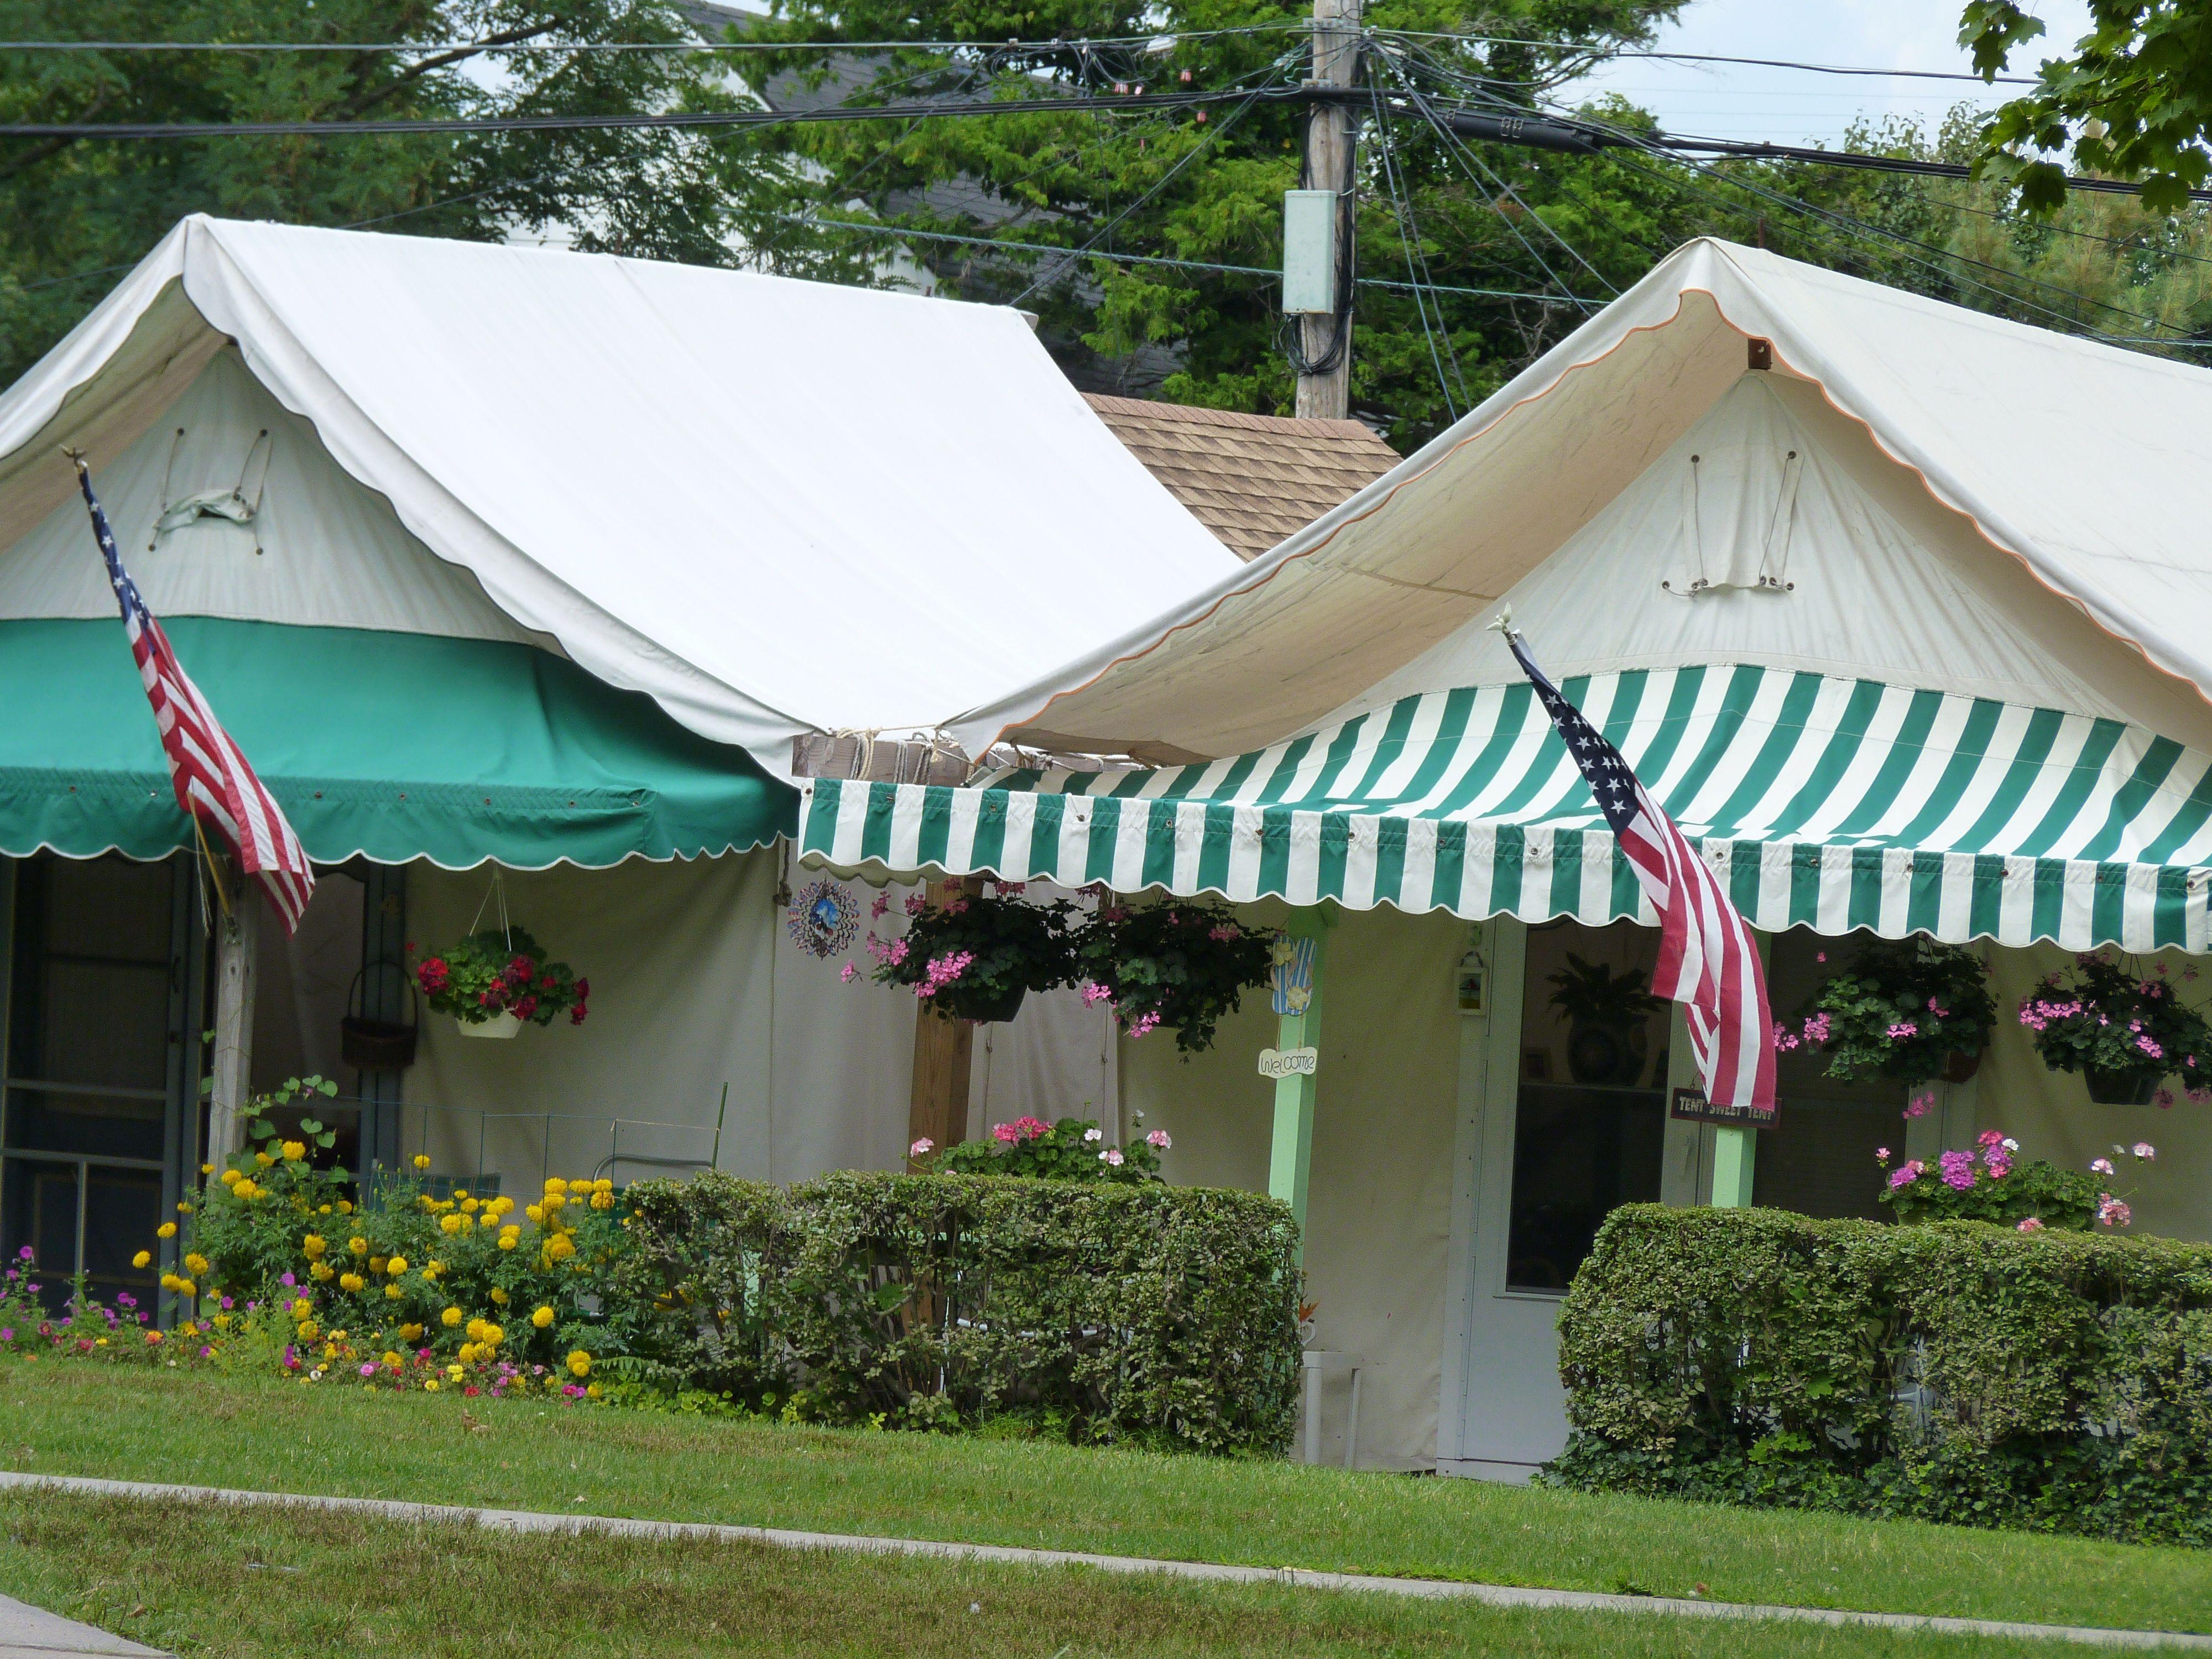 Tent homes. Ocean Grove NJ & Asbury Park   The Write Side of 59